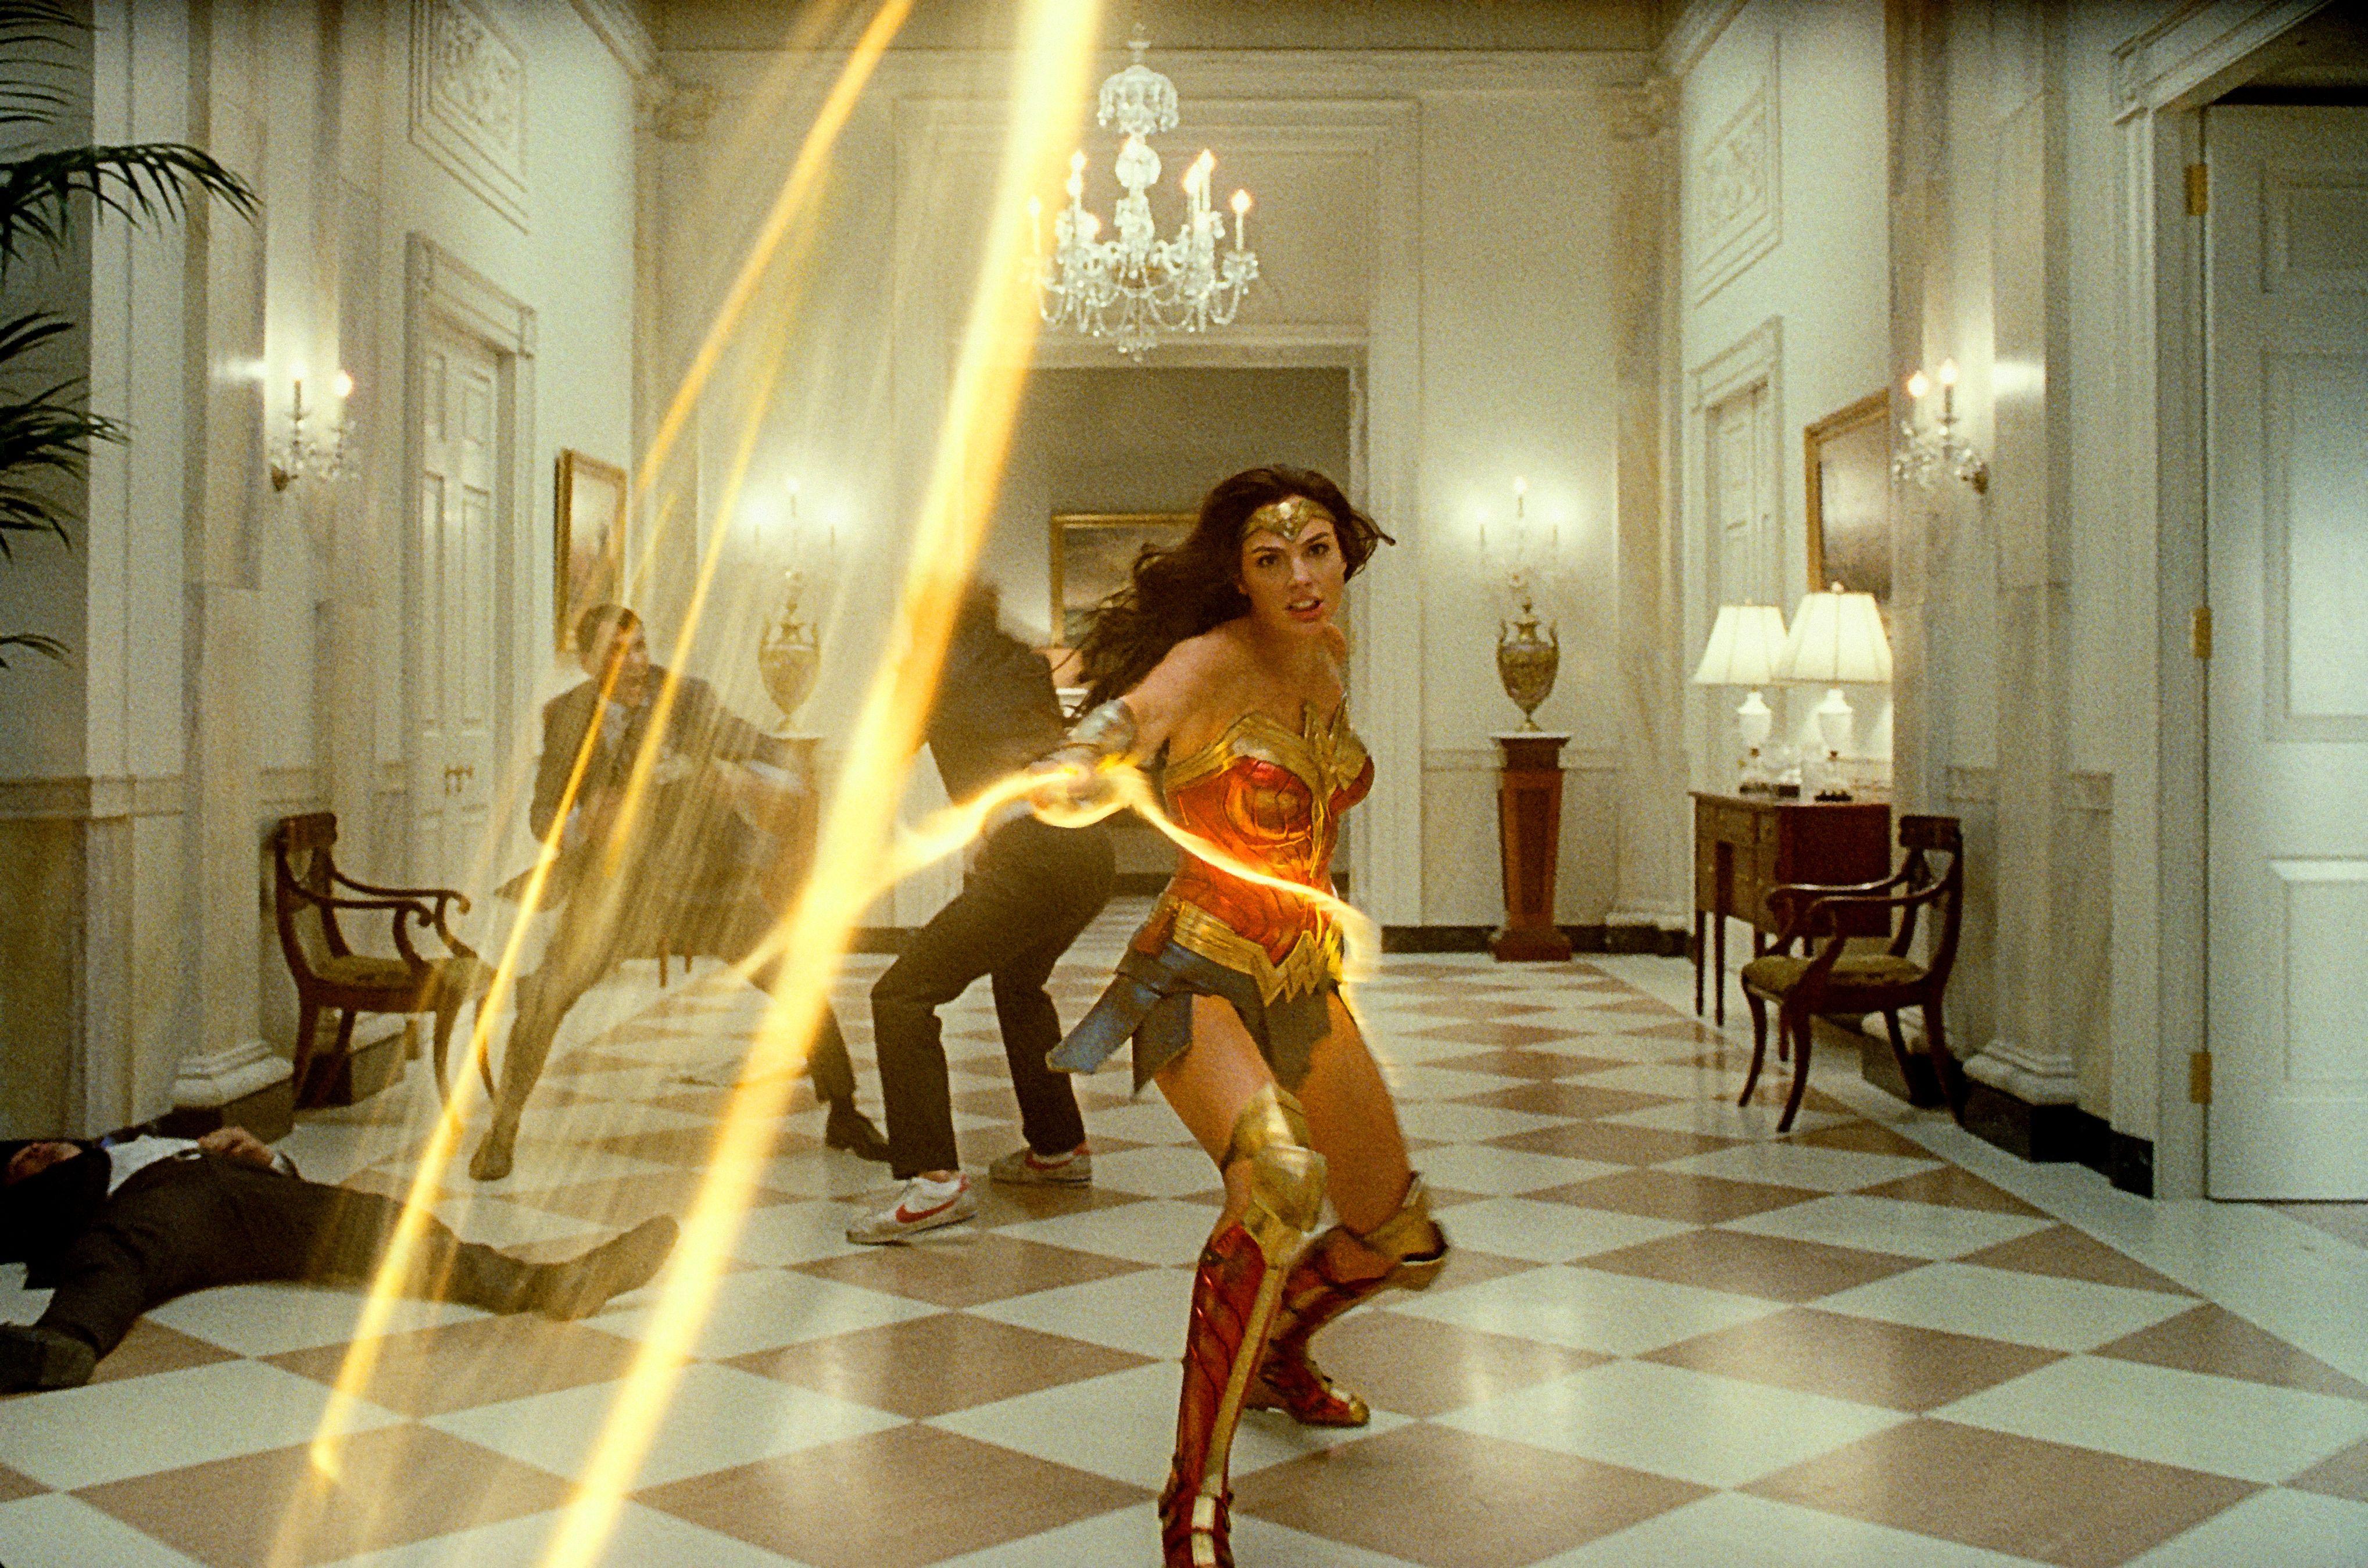 movie wonder woman 1984 4k 1602435730 - Movie Wonder Woman 1984 4k - Movie Wonder Woman 1984 4k wallpapers